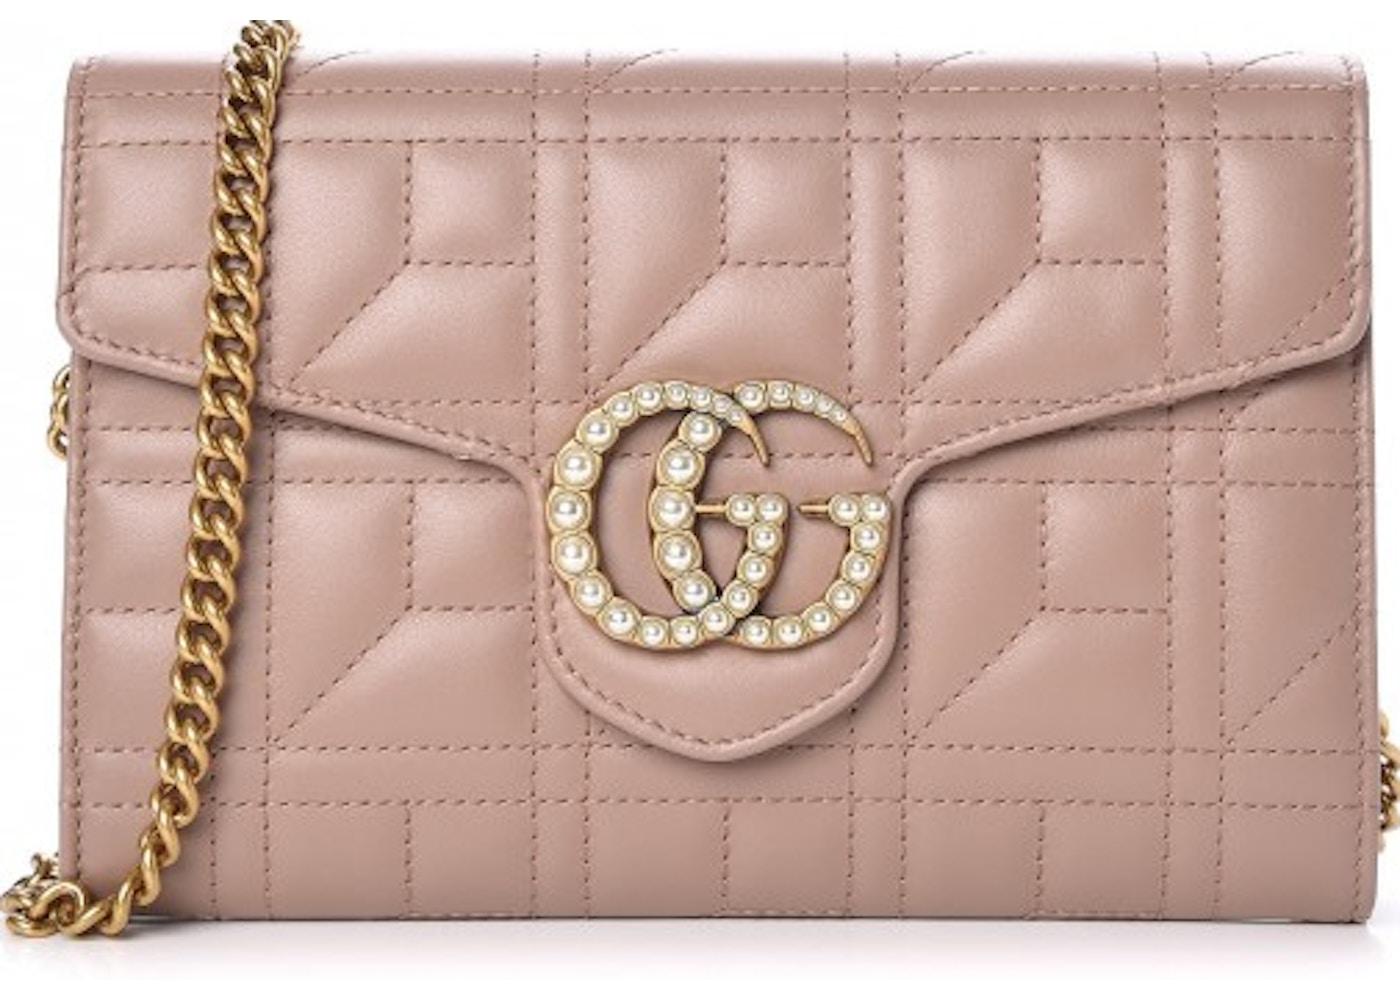 54ec6ff84151f6 Gucci Marmont Flap Matelasse GG Studded Pearls Mini Porcelain Rose